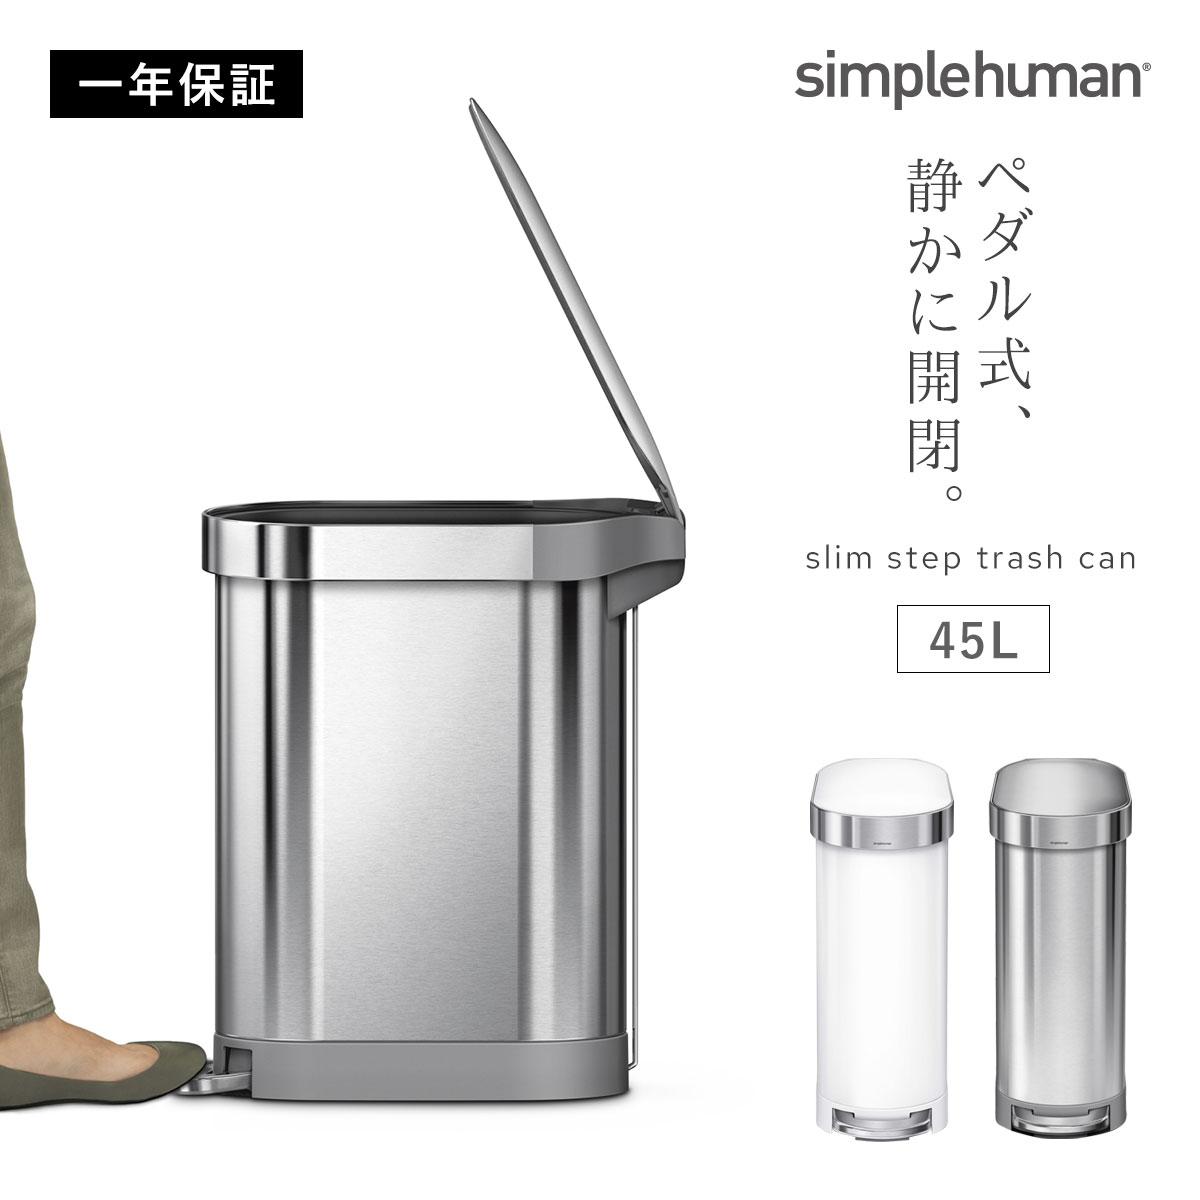 simplehuman シンプルヒューマン スリムステップカン 45L 00125 メーカー直送 返品不可